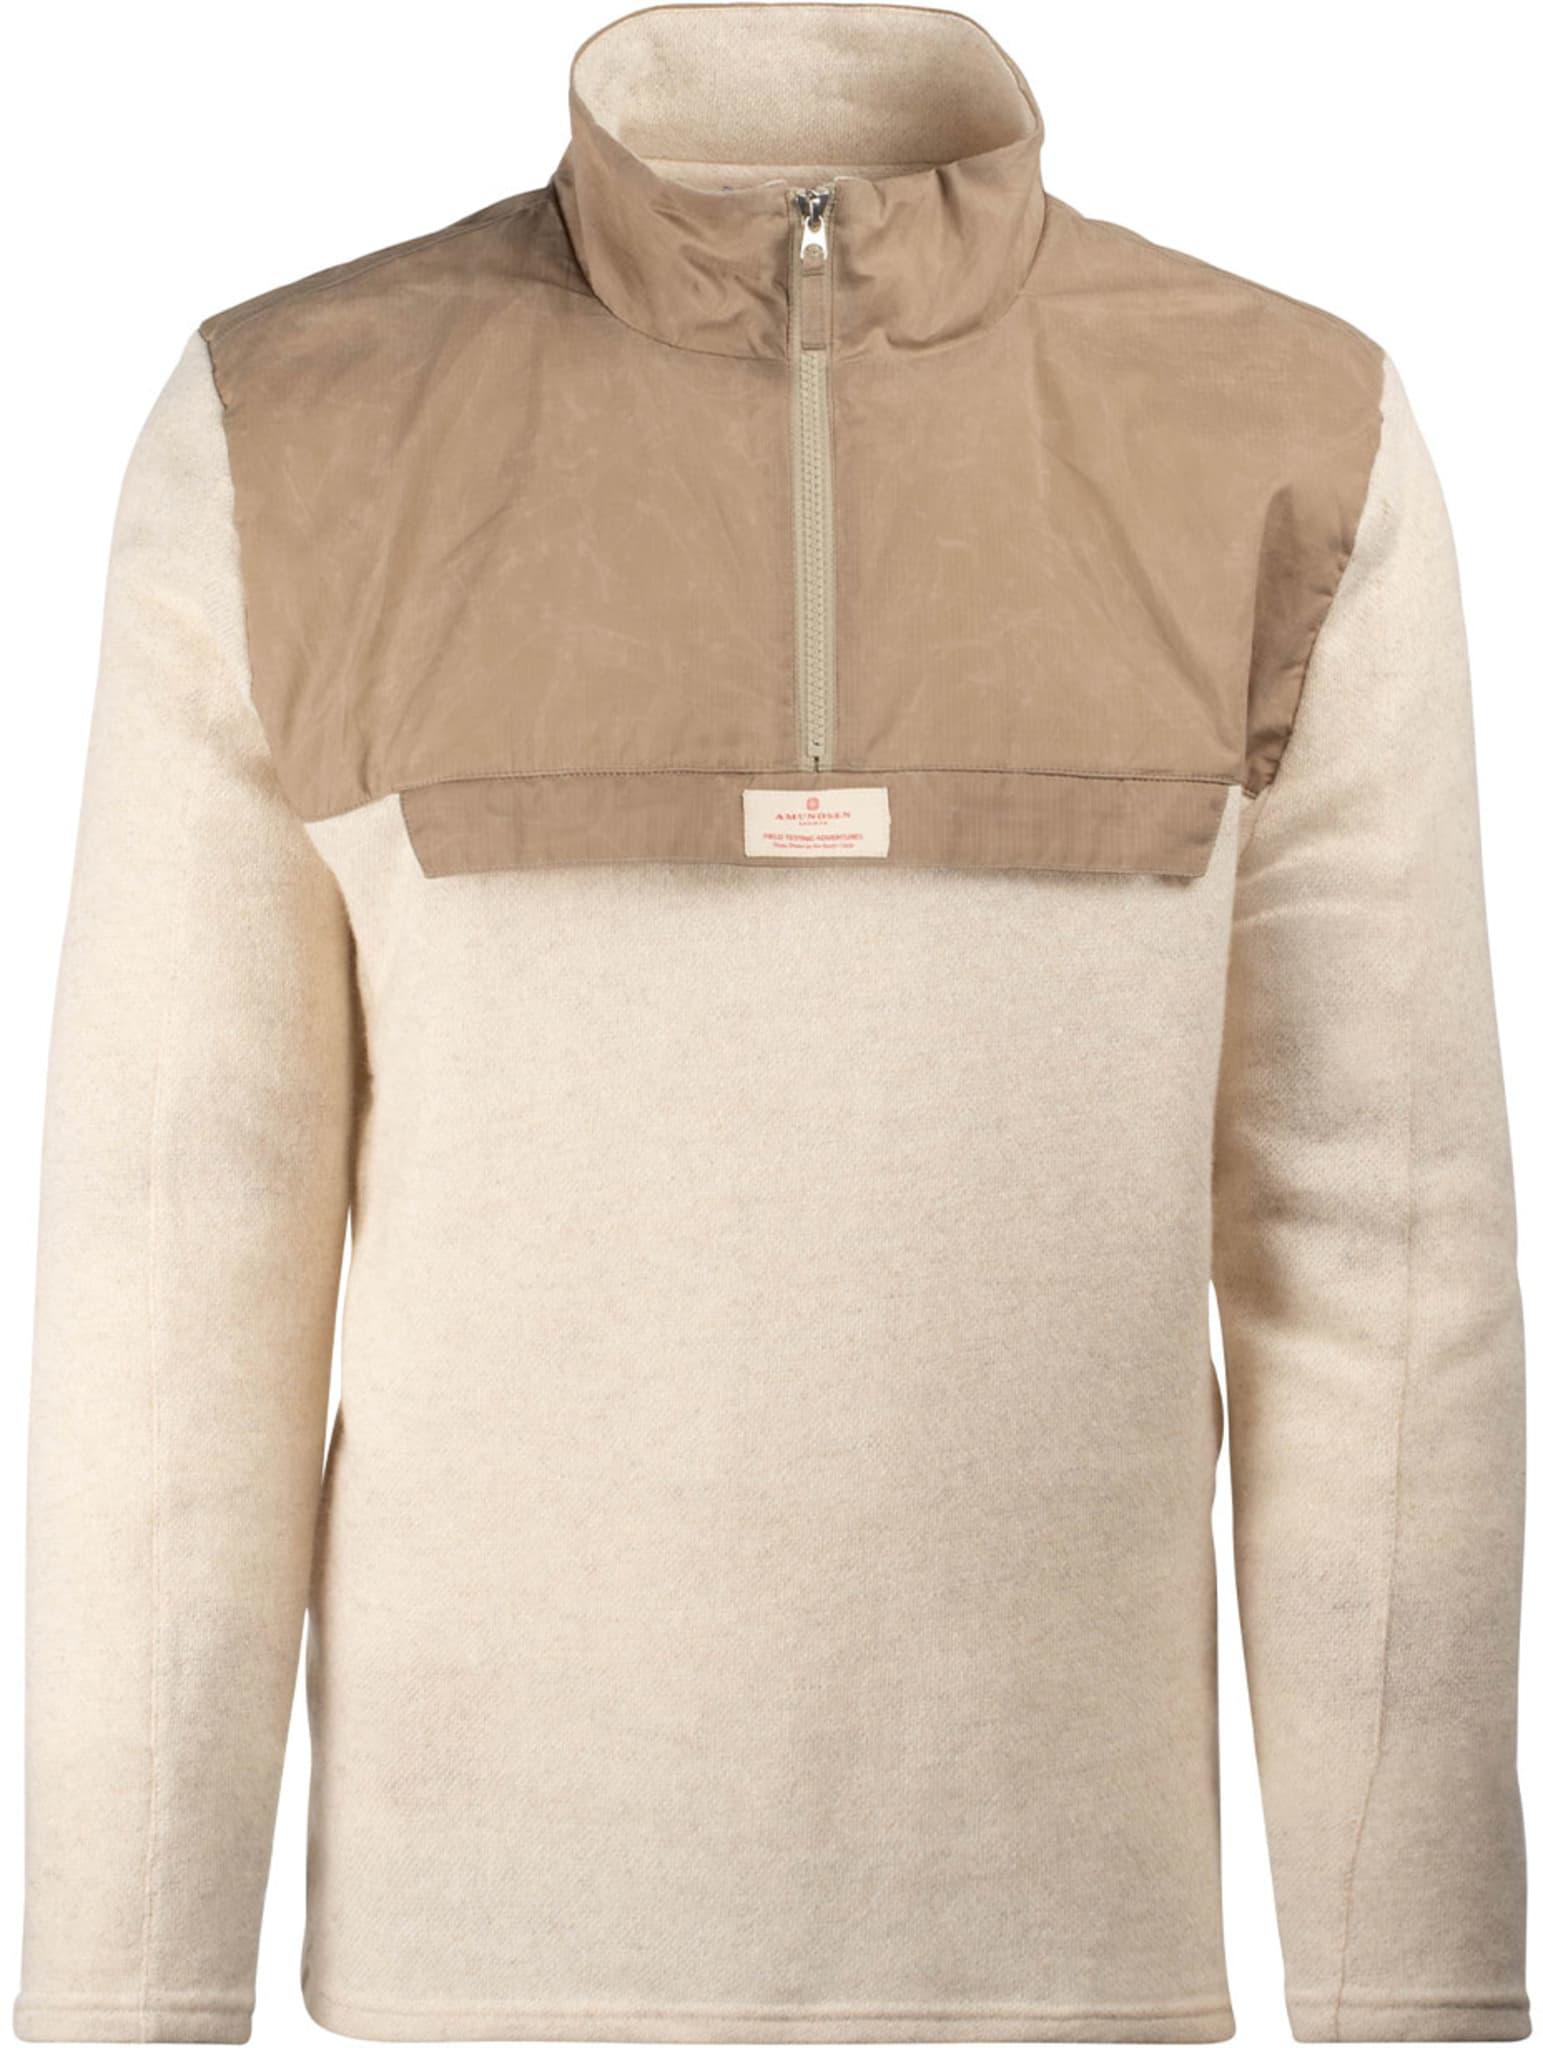 Skauen Wool Sweater M